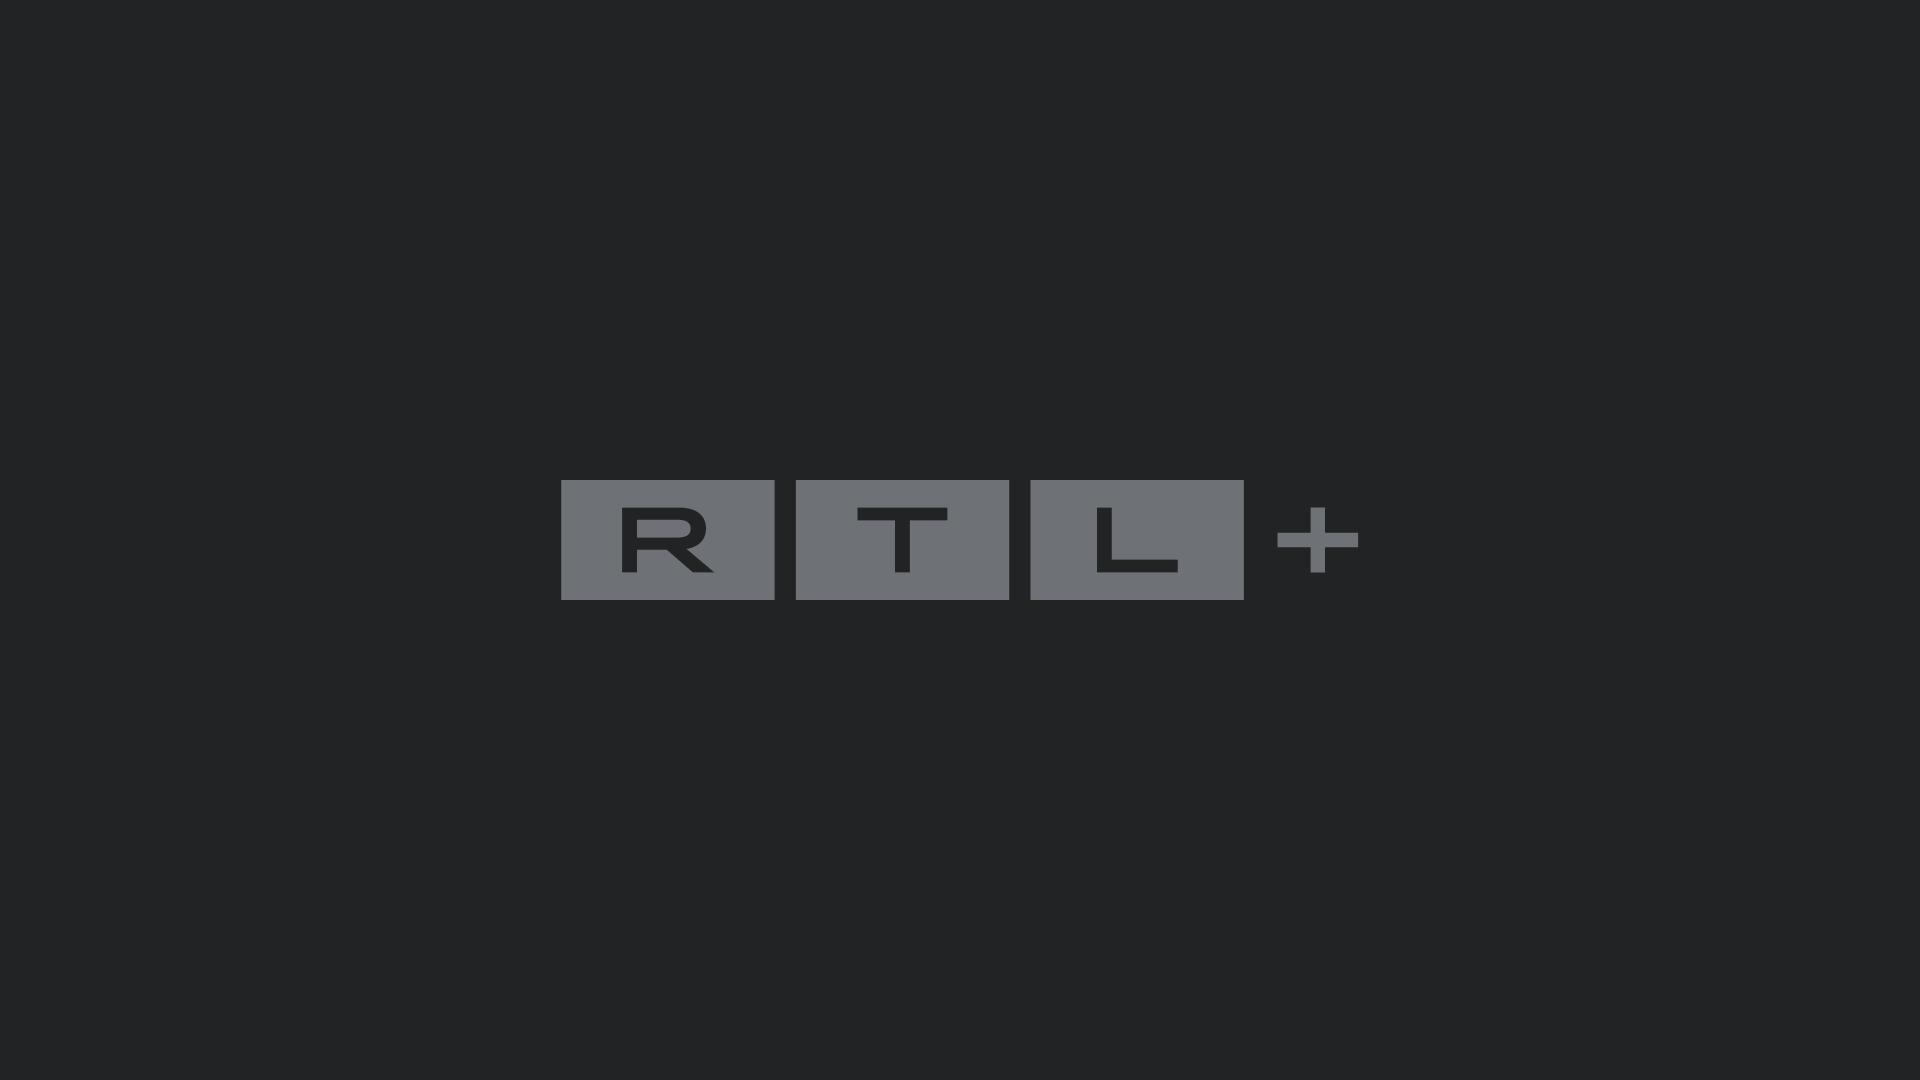 GZSZ - Der Gerner Clan  Affären, Schicksale & Intrigen | Folge 11